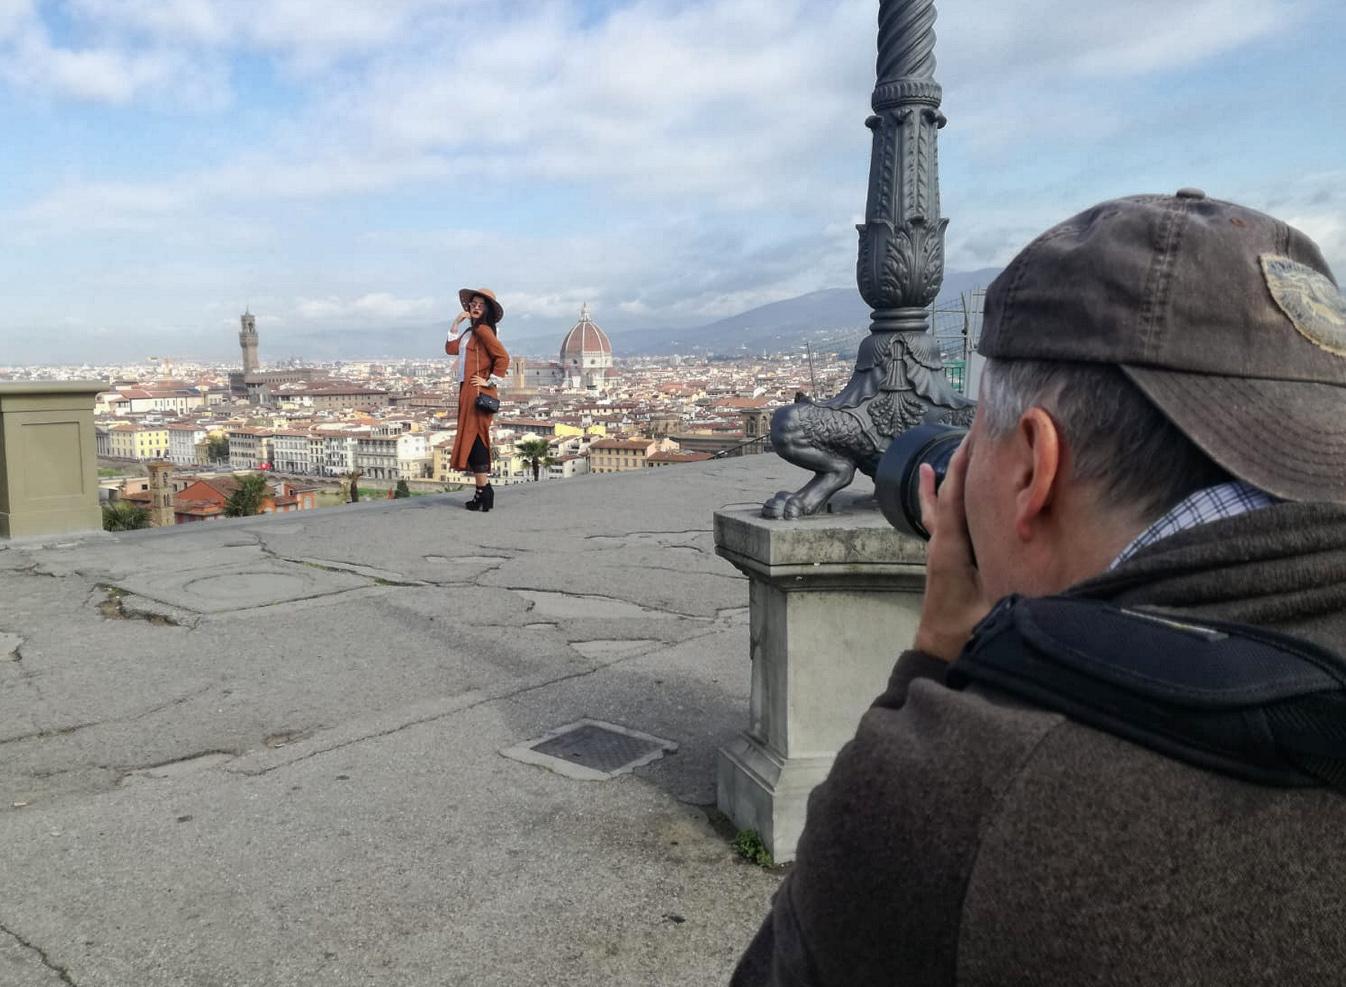 Behind the Scene on Piazzale Michelangelo